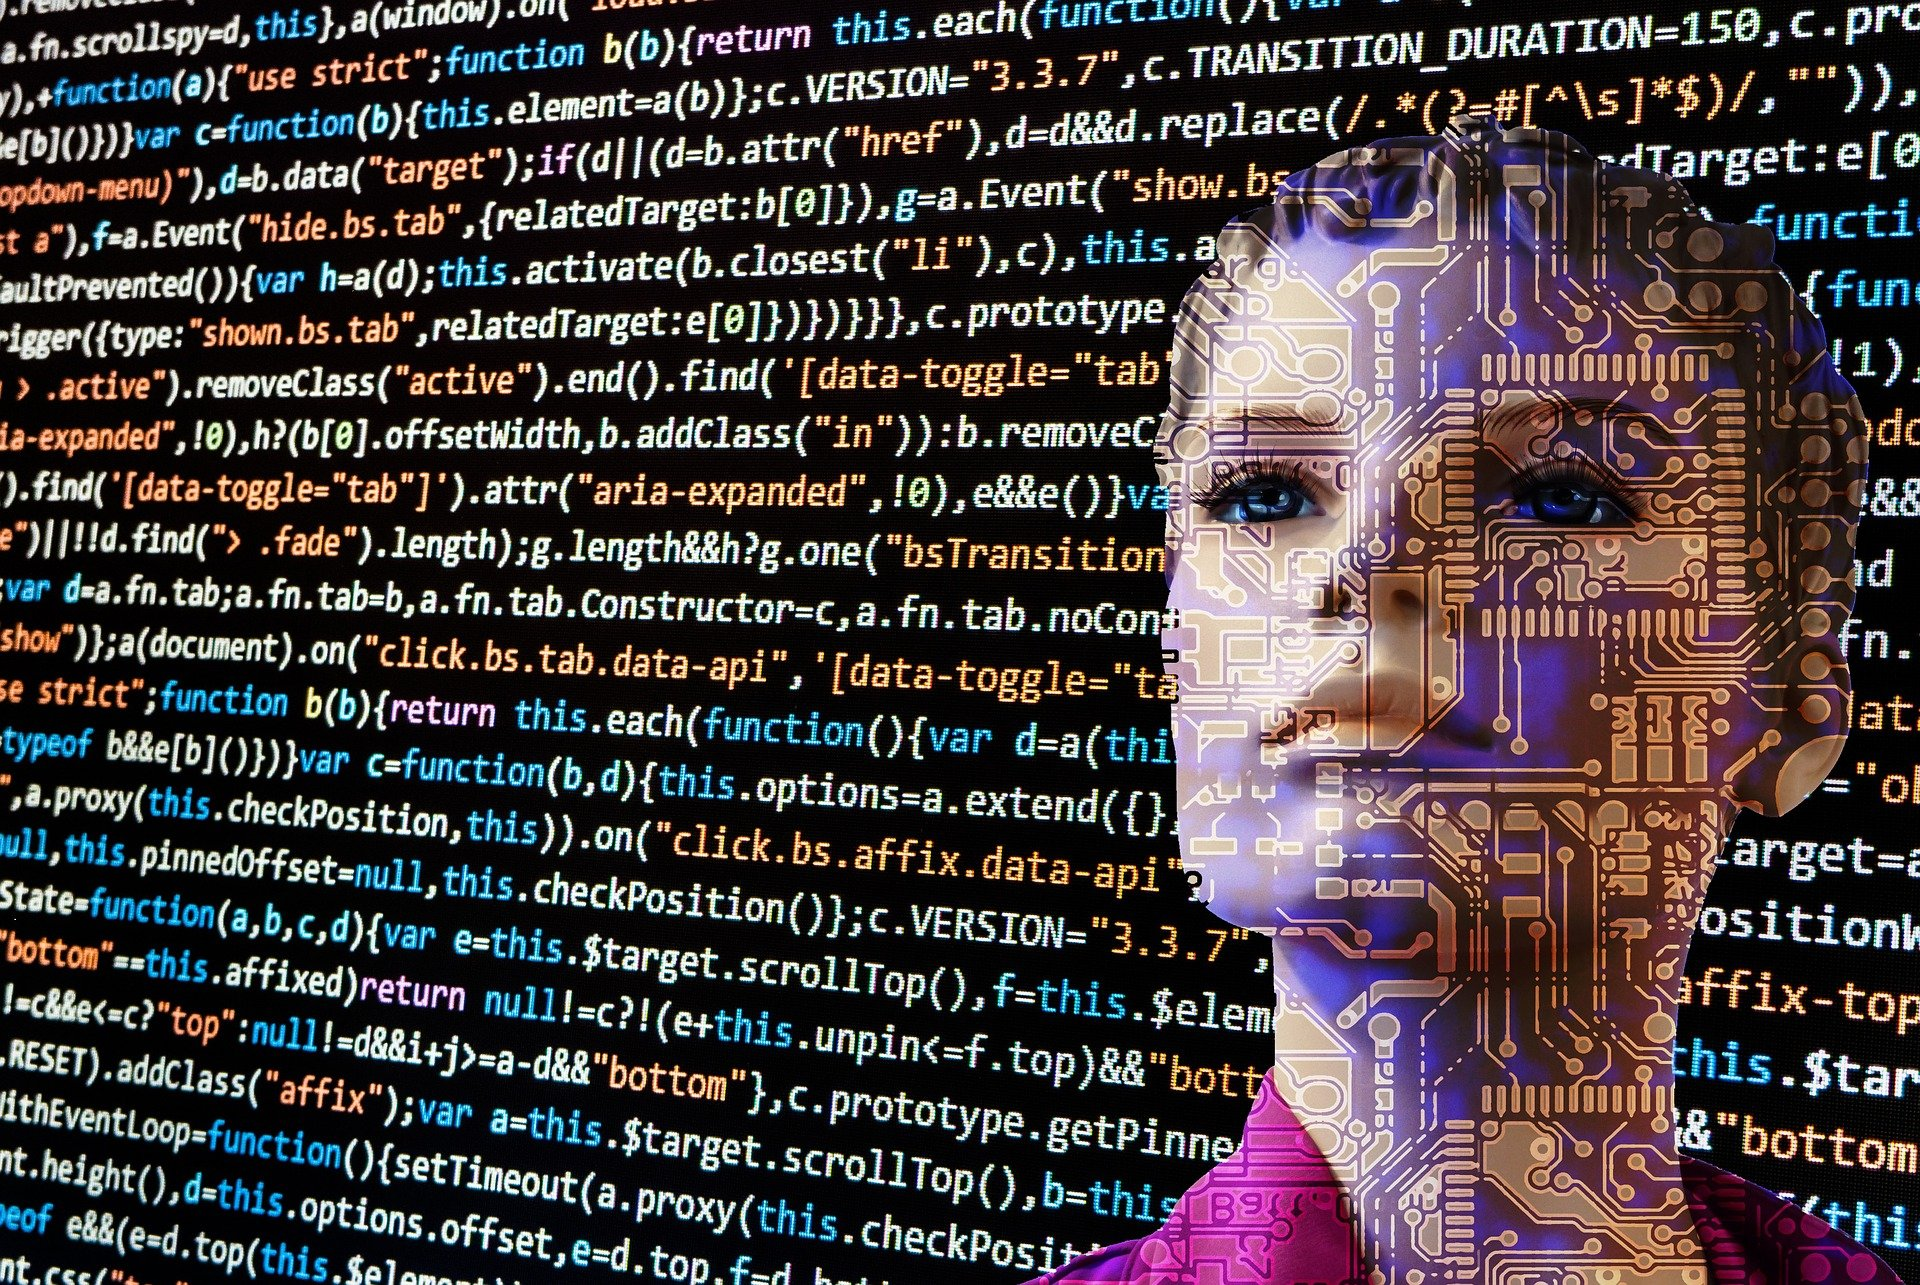 Robotic und KI